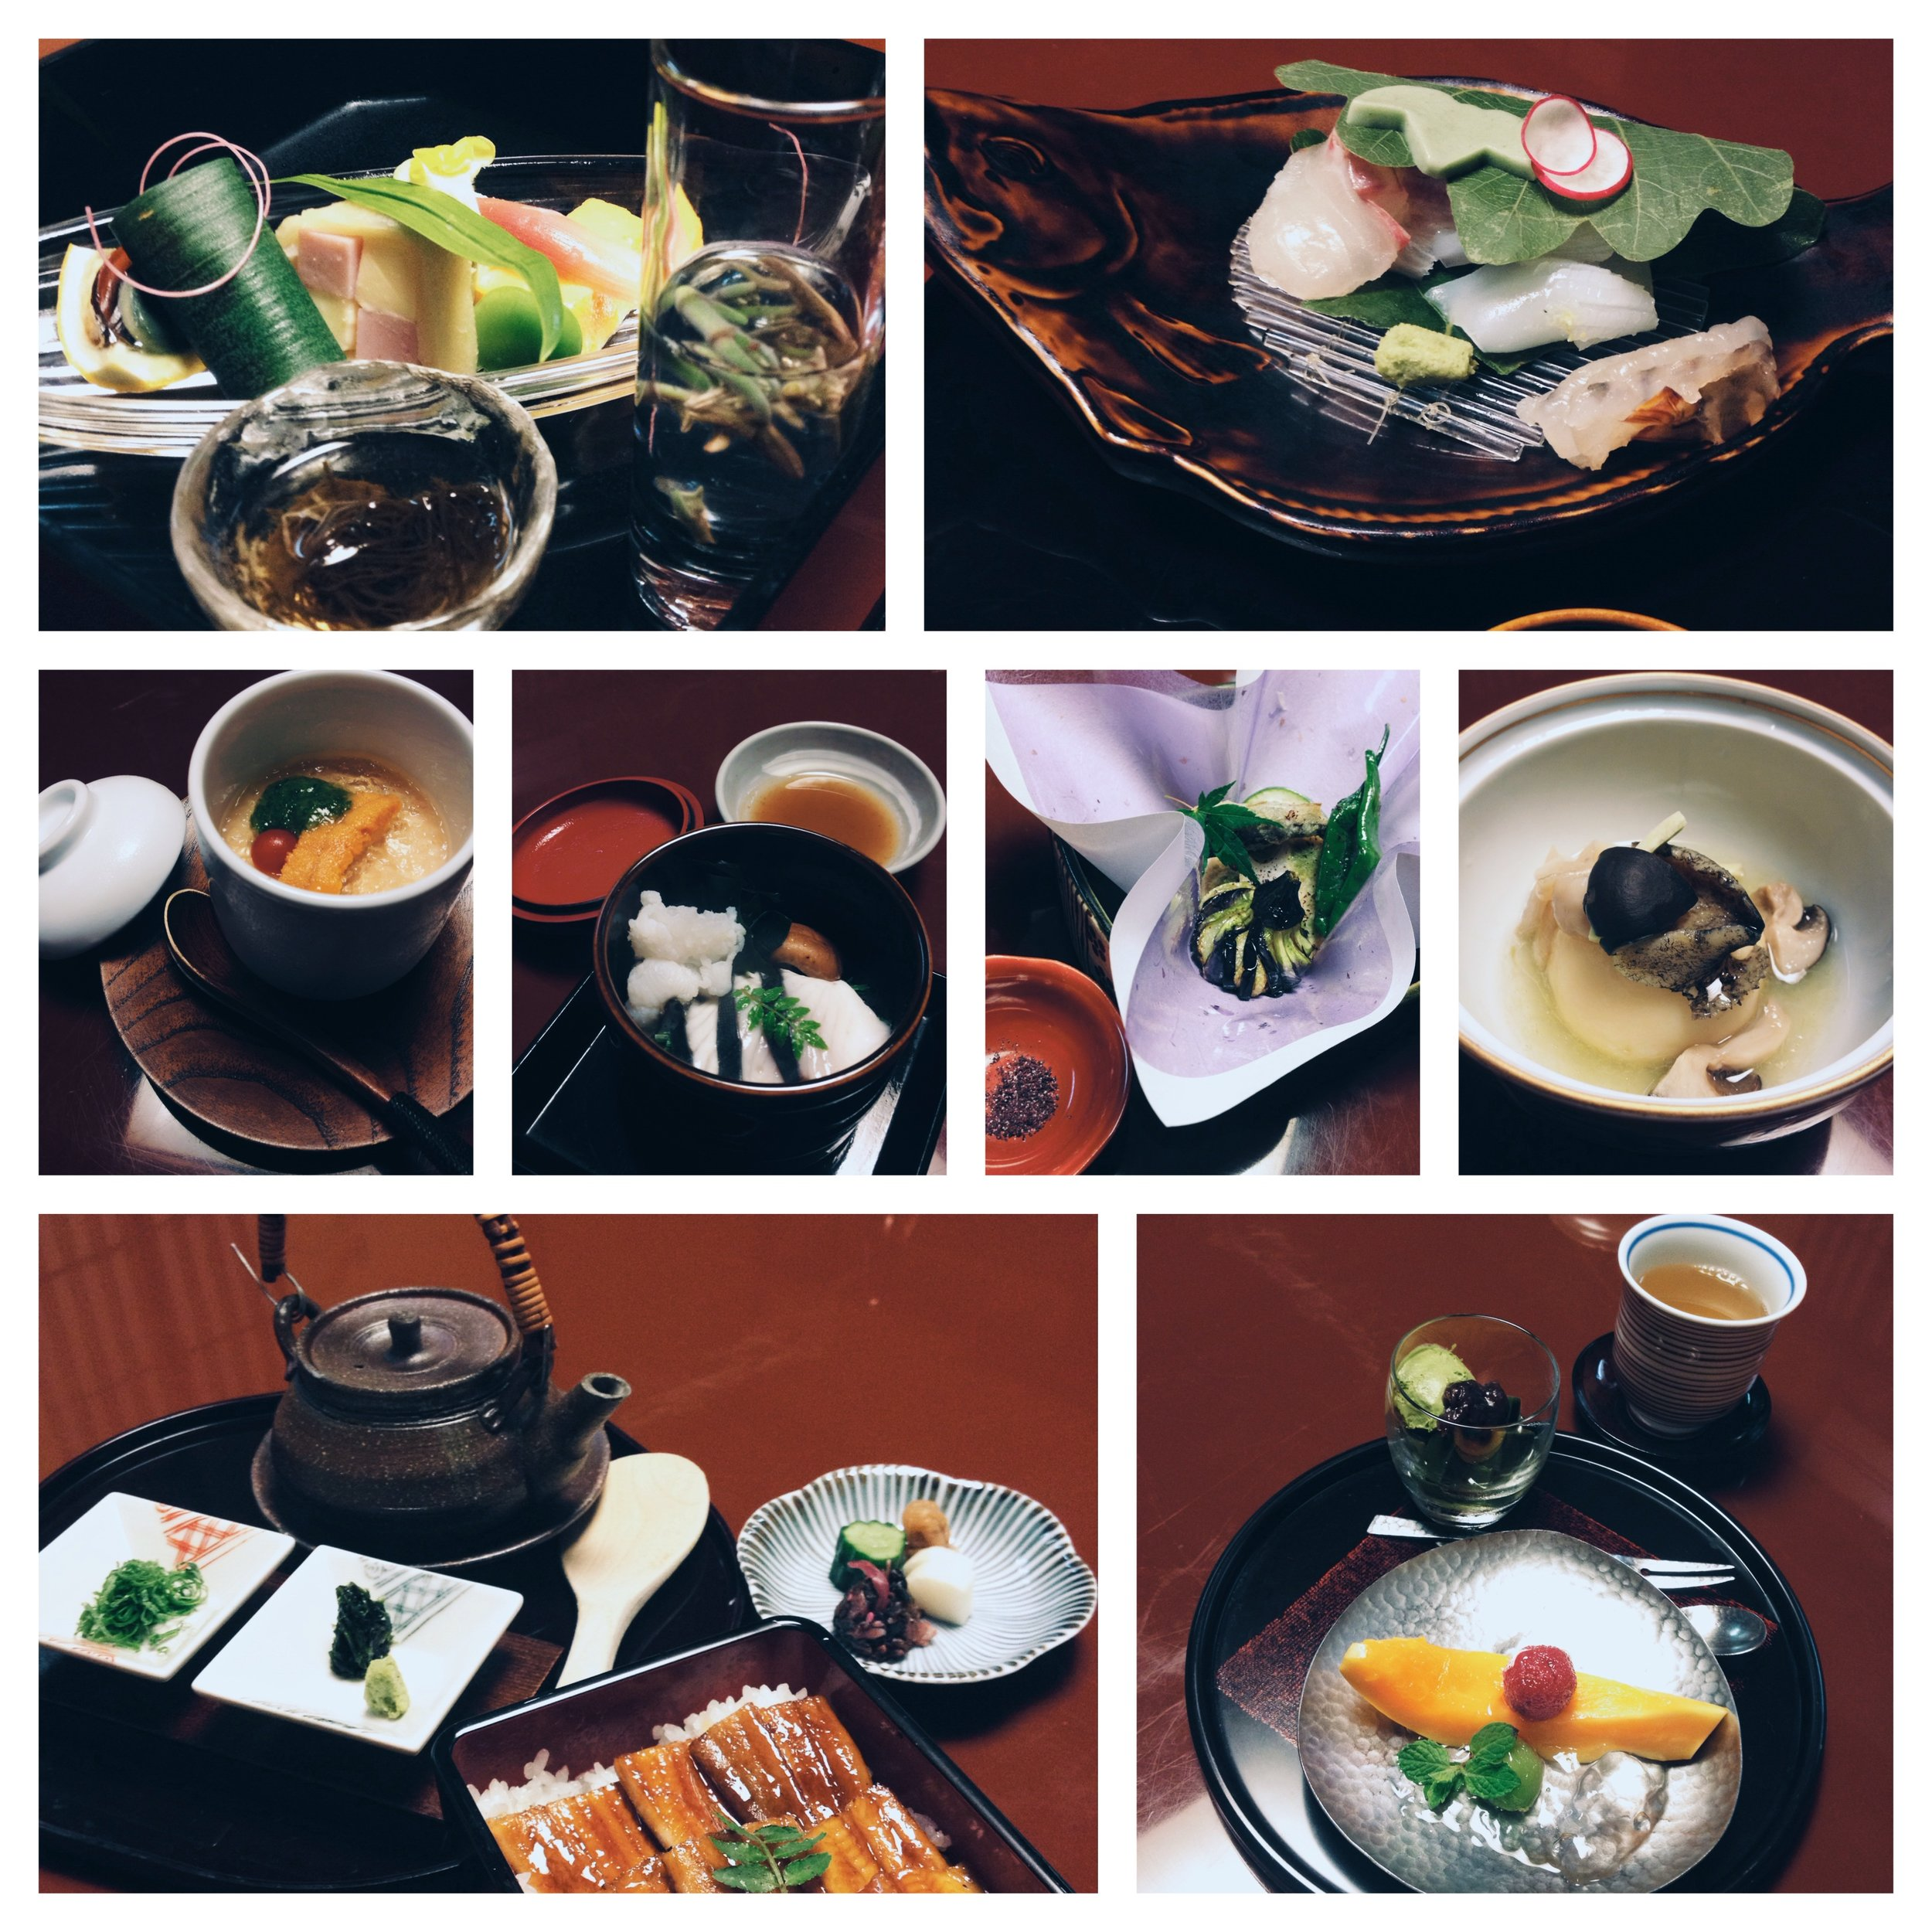 7-course dinner at ryokan Iwaso, Miyajima.